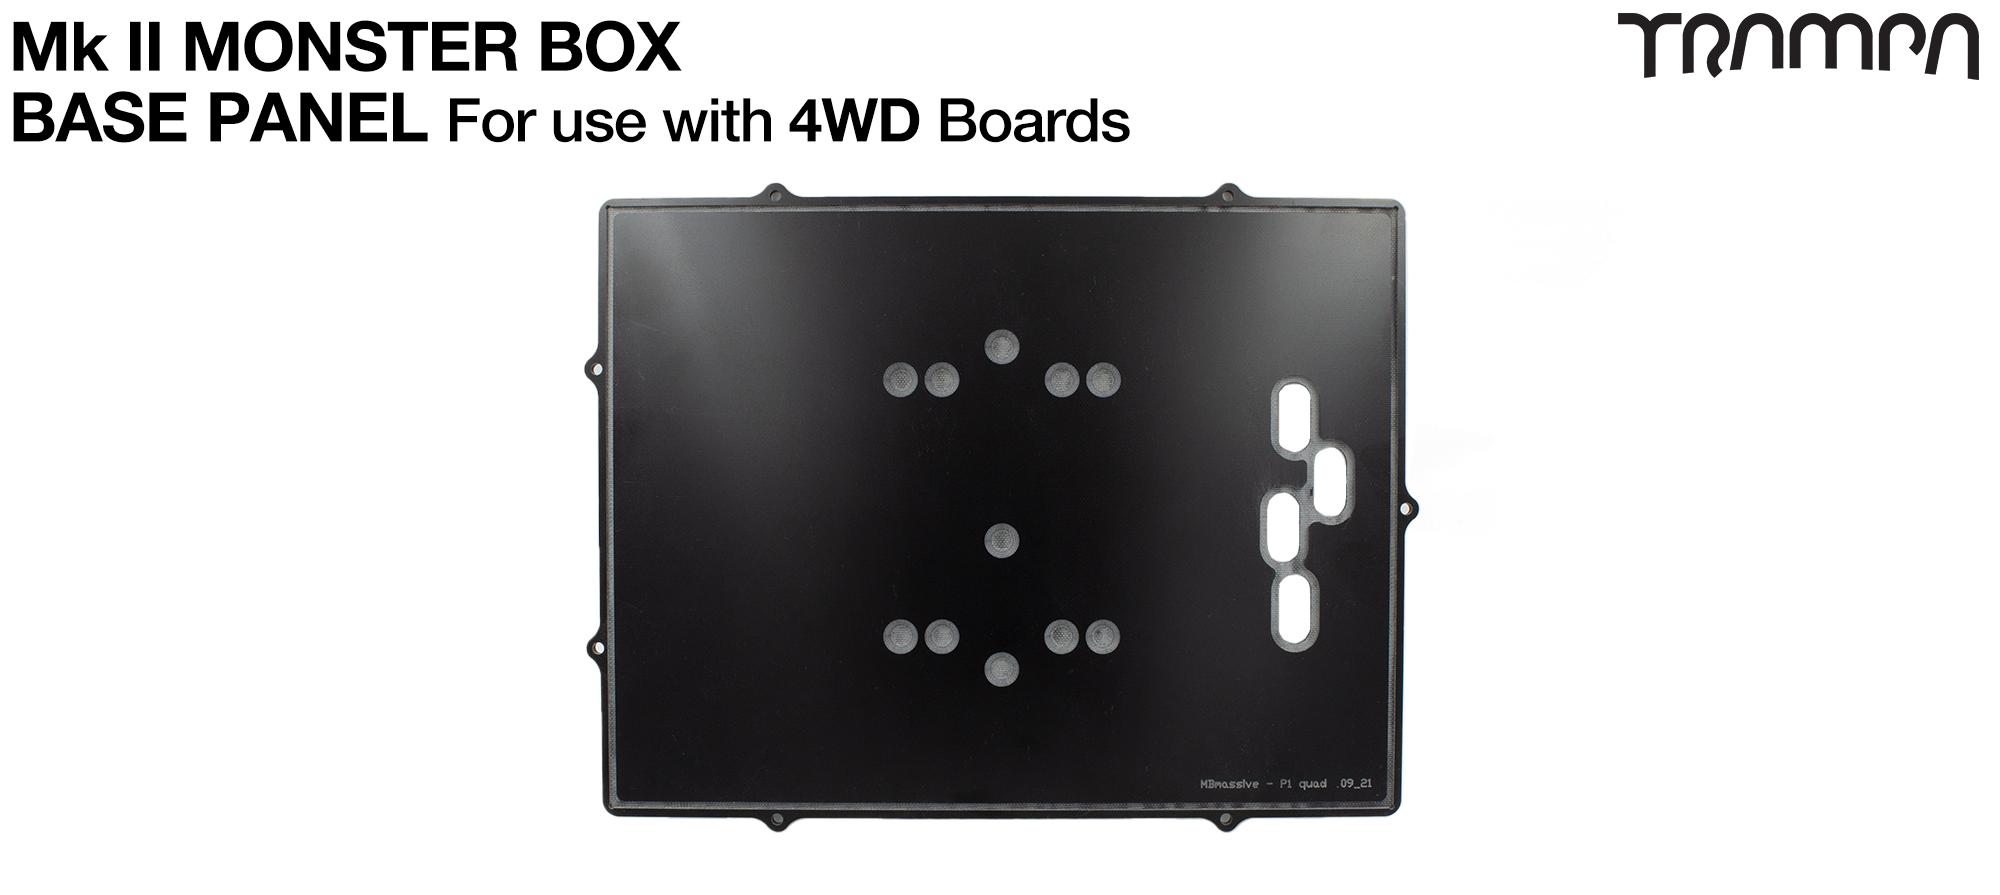 MASSIVE Monster Box BASE for 4WD Li-Ion Cells